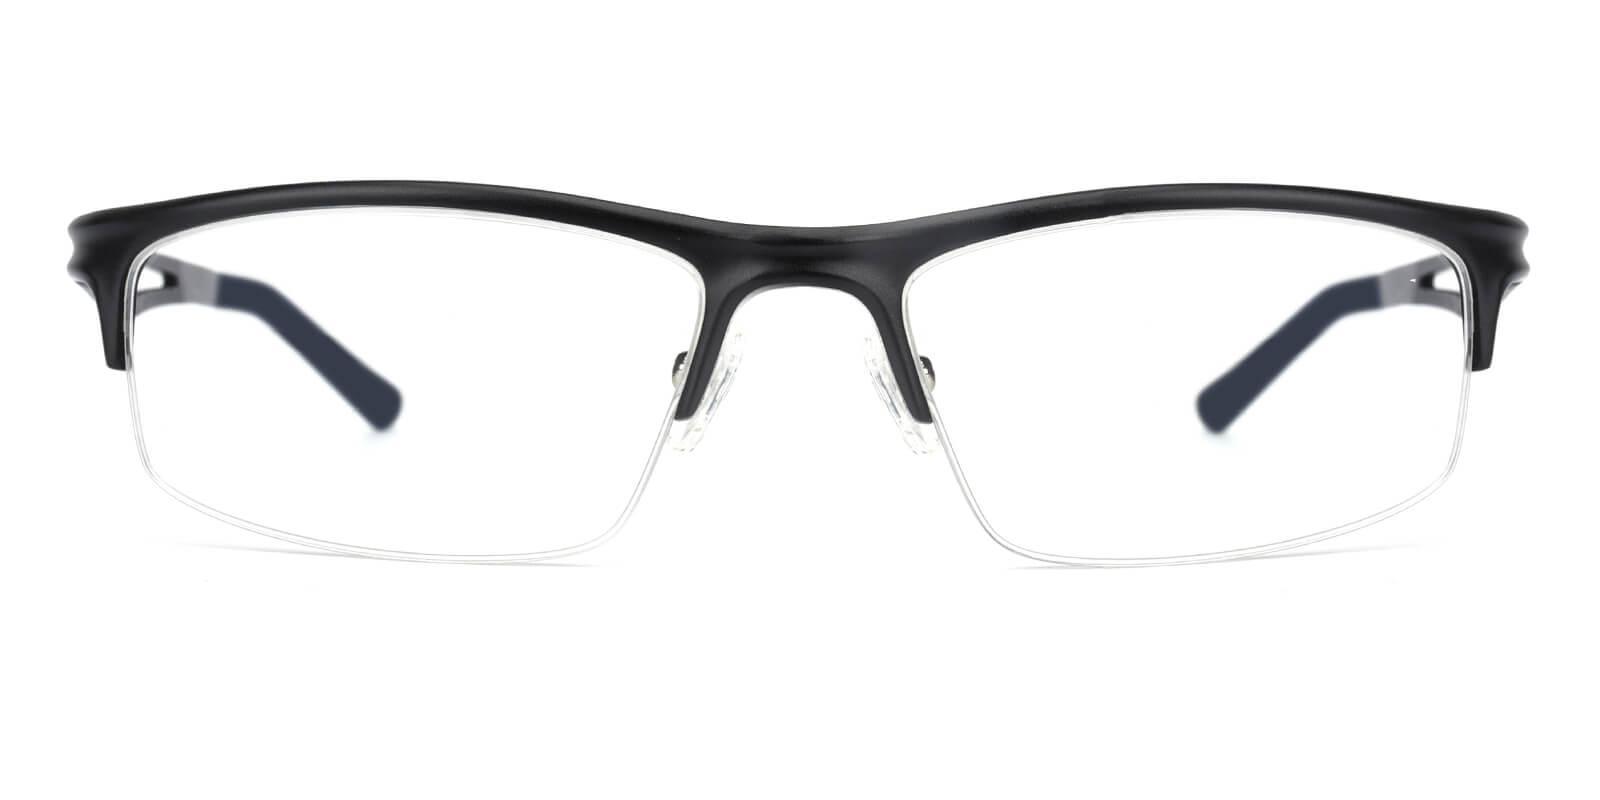 Muhammad-Black-Rectangle-Metal-Eyeglasses-additional2